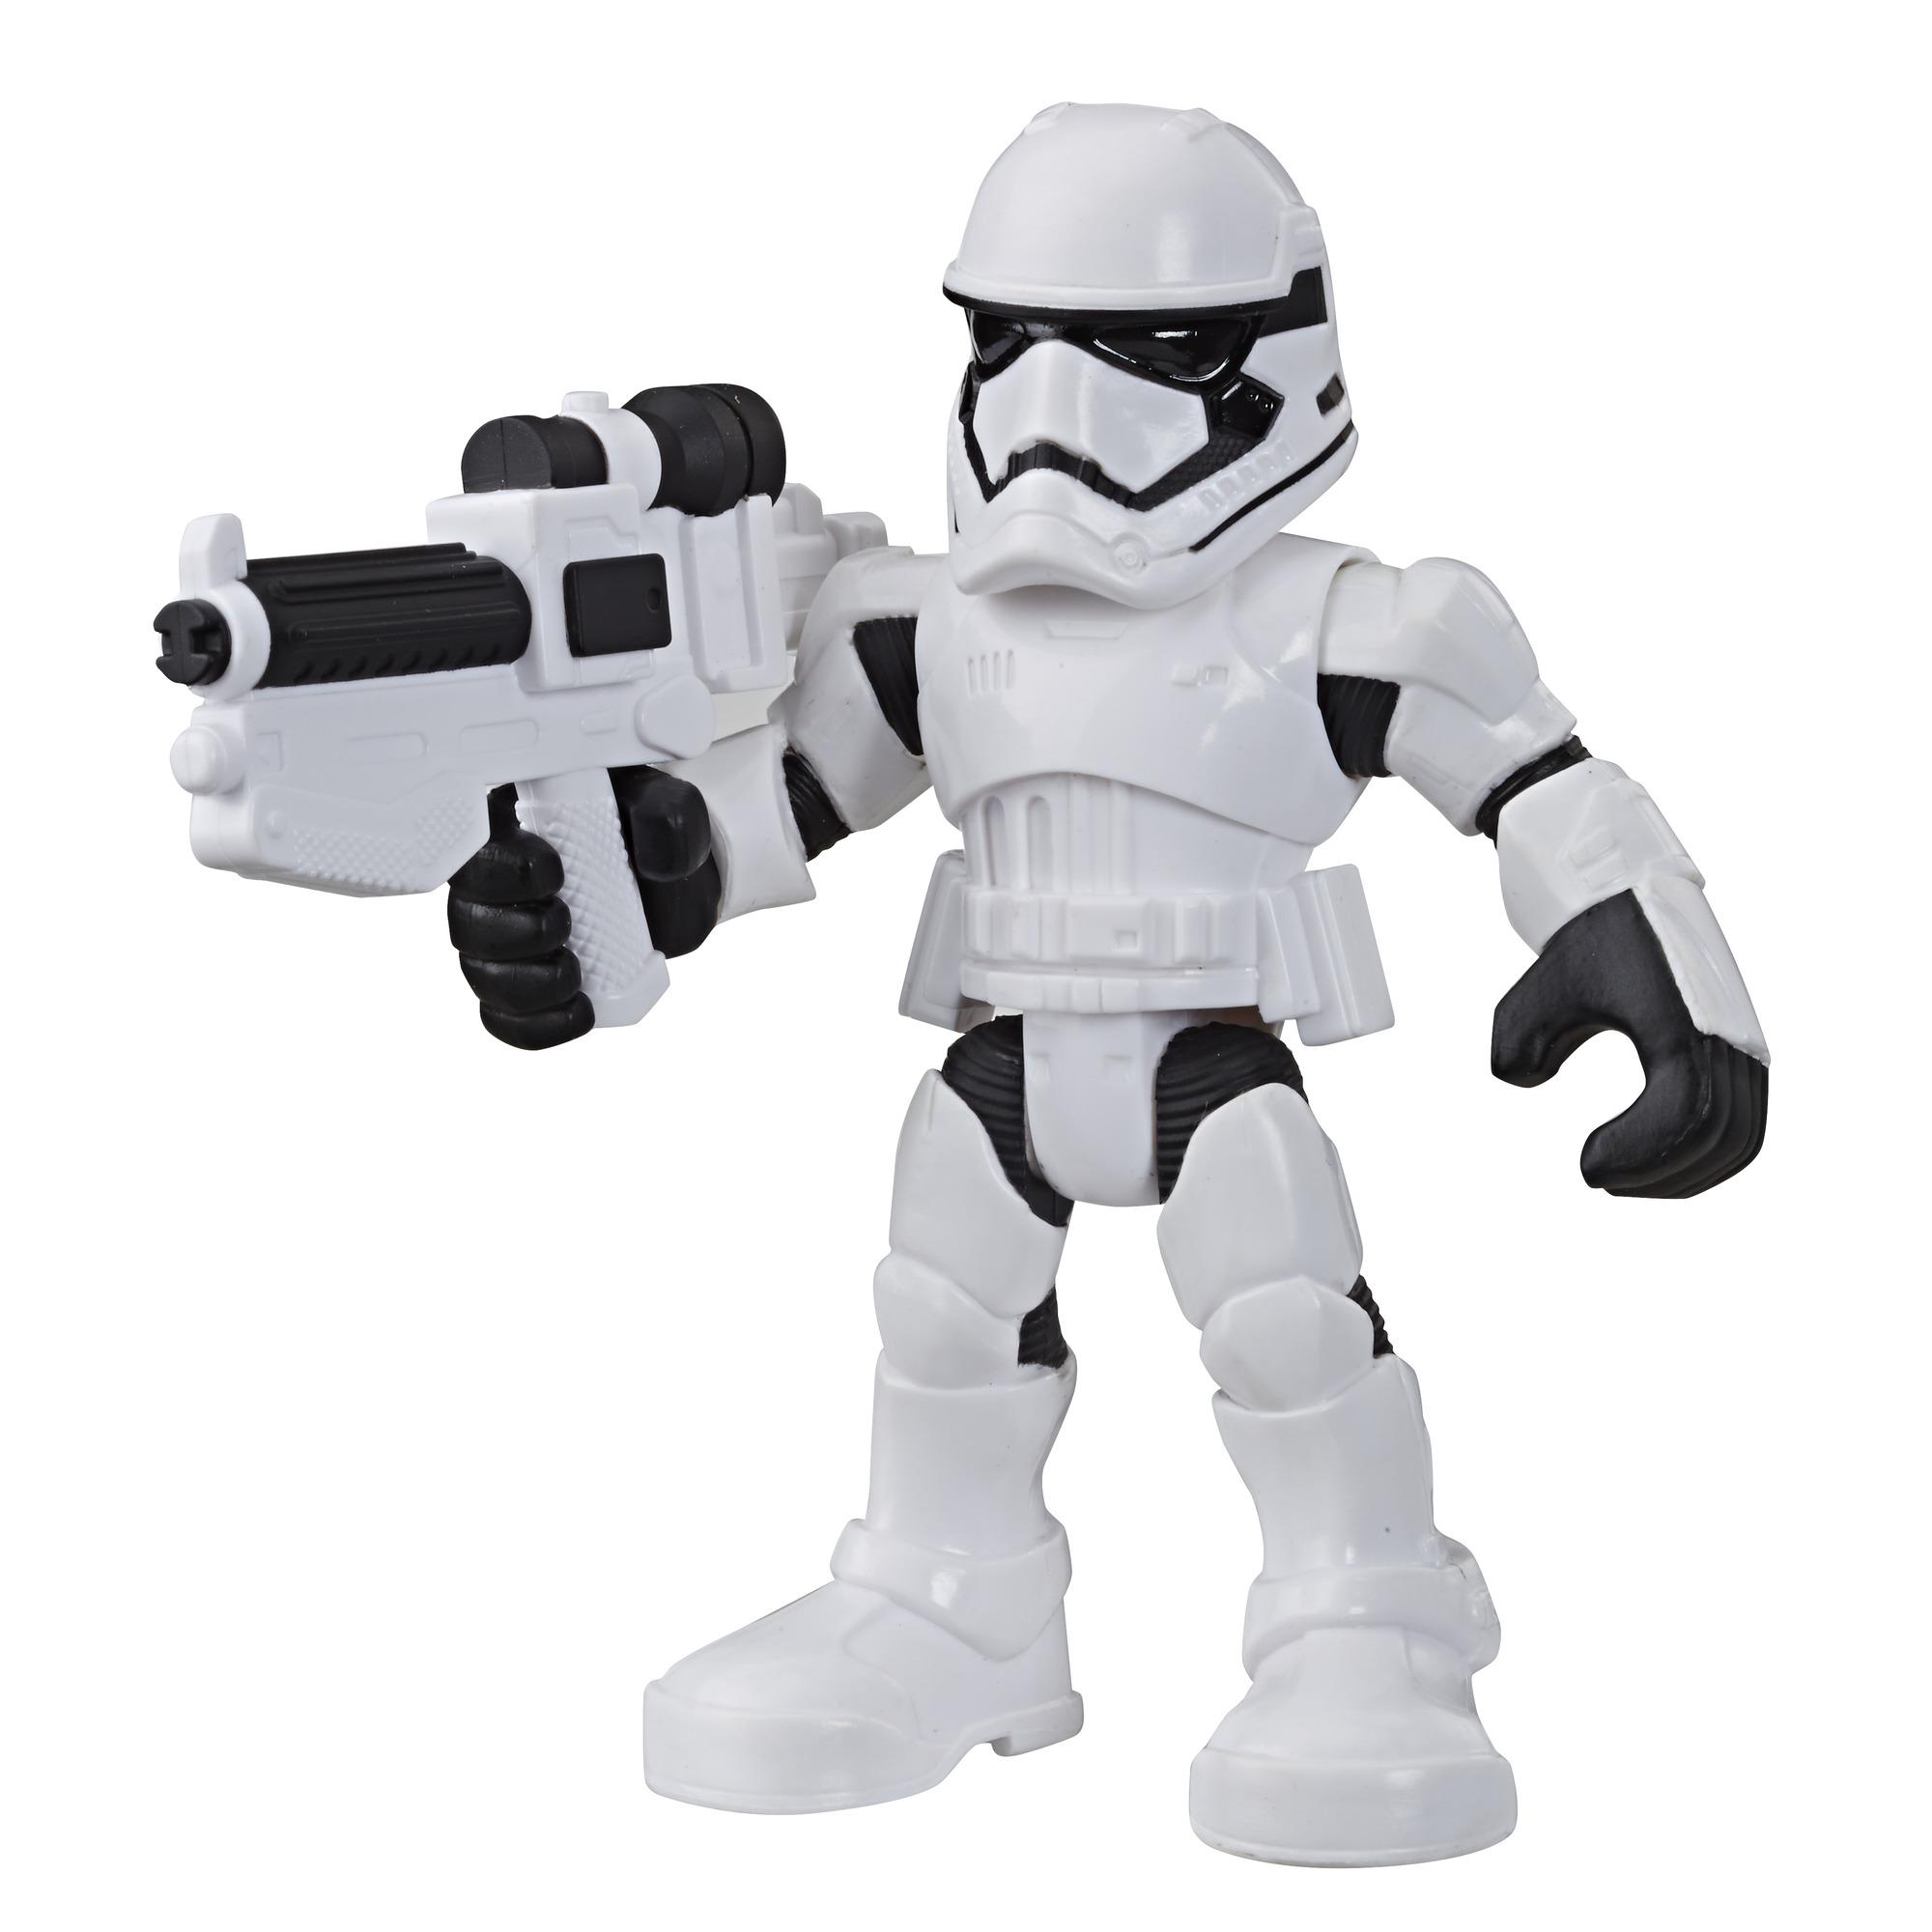 TRO GH FO Stormtrooper Mega figure 2